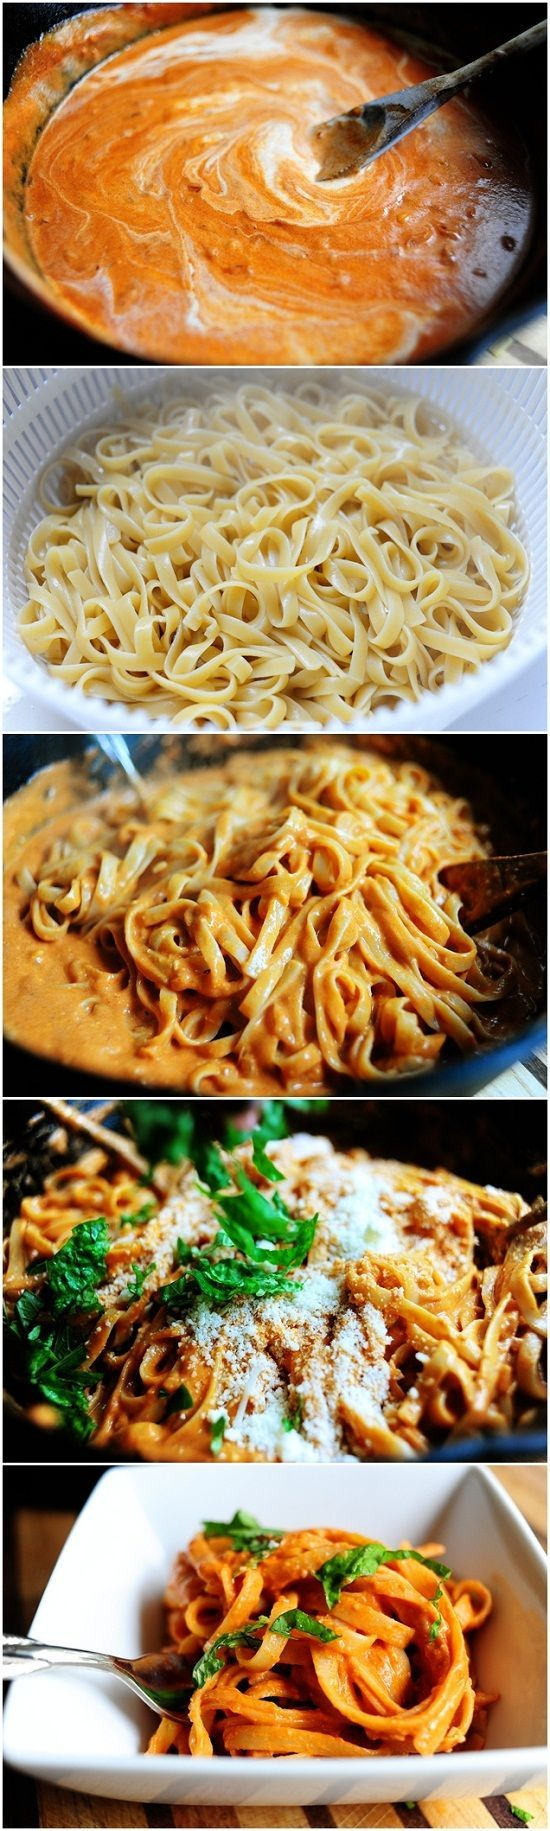 Pasta with Tomato Cream Sauce.  Since I need to watch my cholesterol I will use fat free half/half.  Whole wheat pasta.